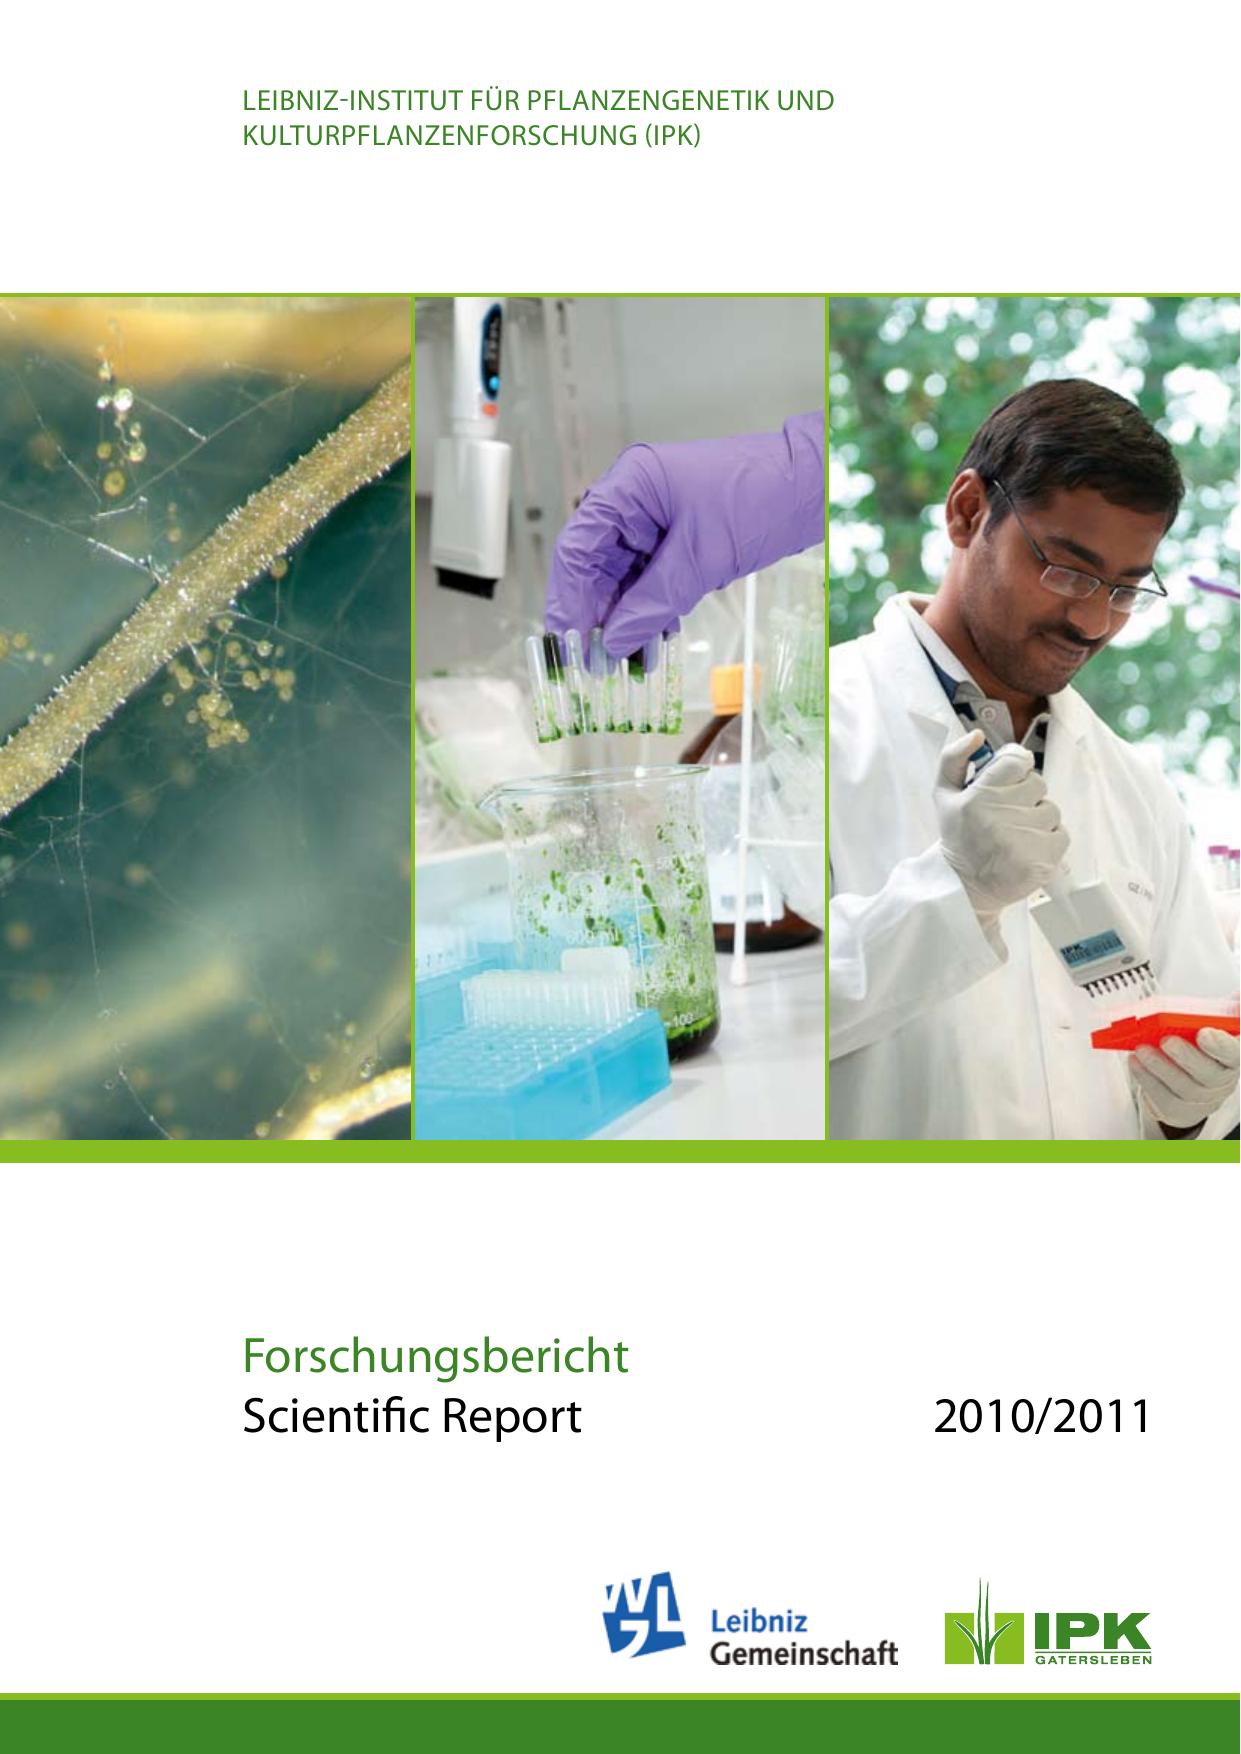 2010/2011 Forschungsbericht Scientific Report | manualzz com